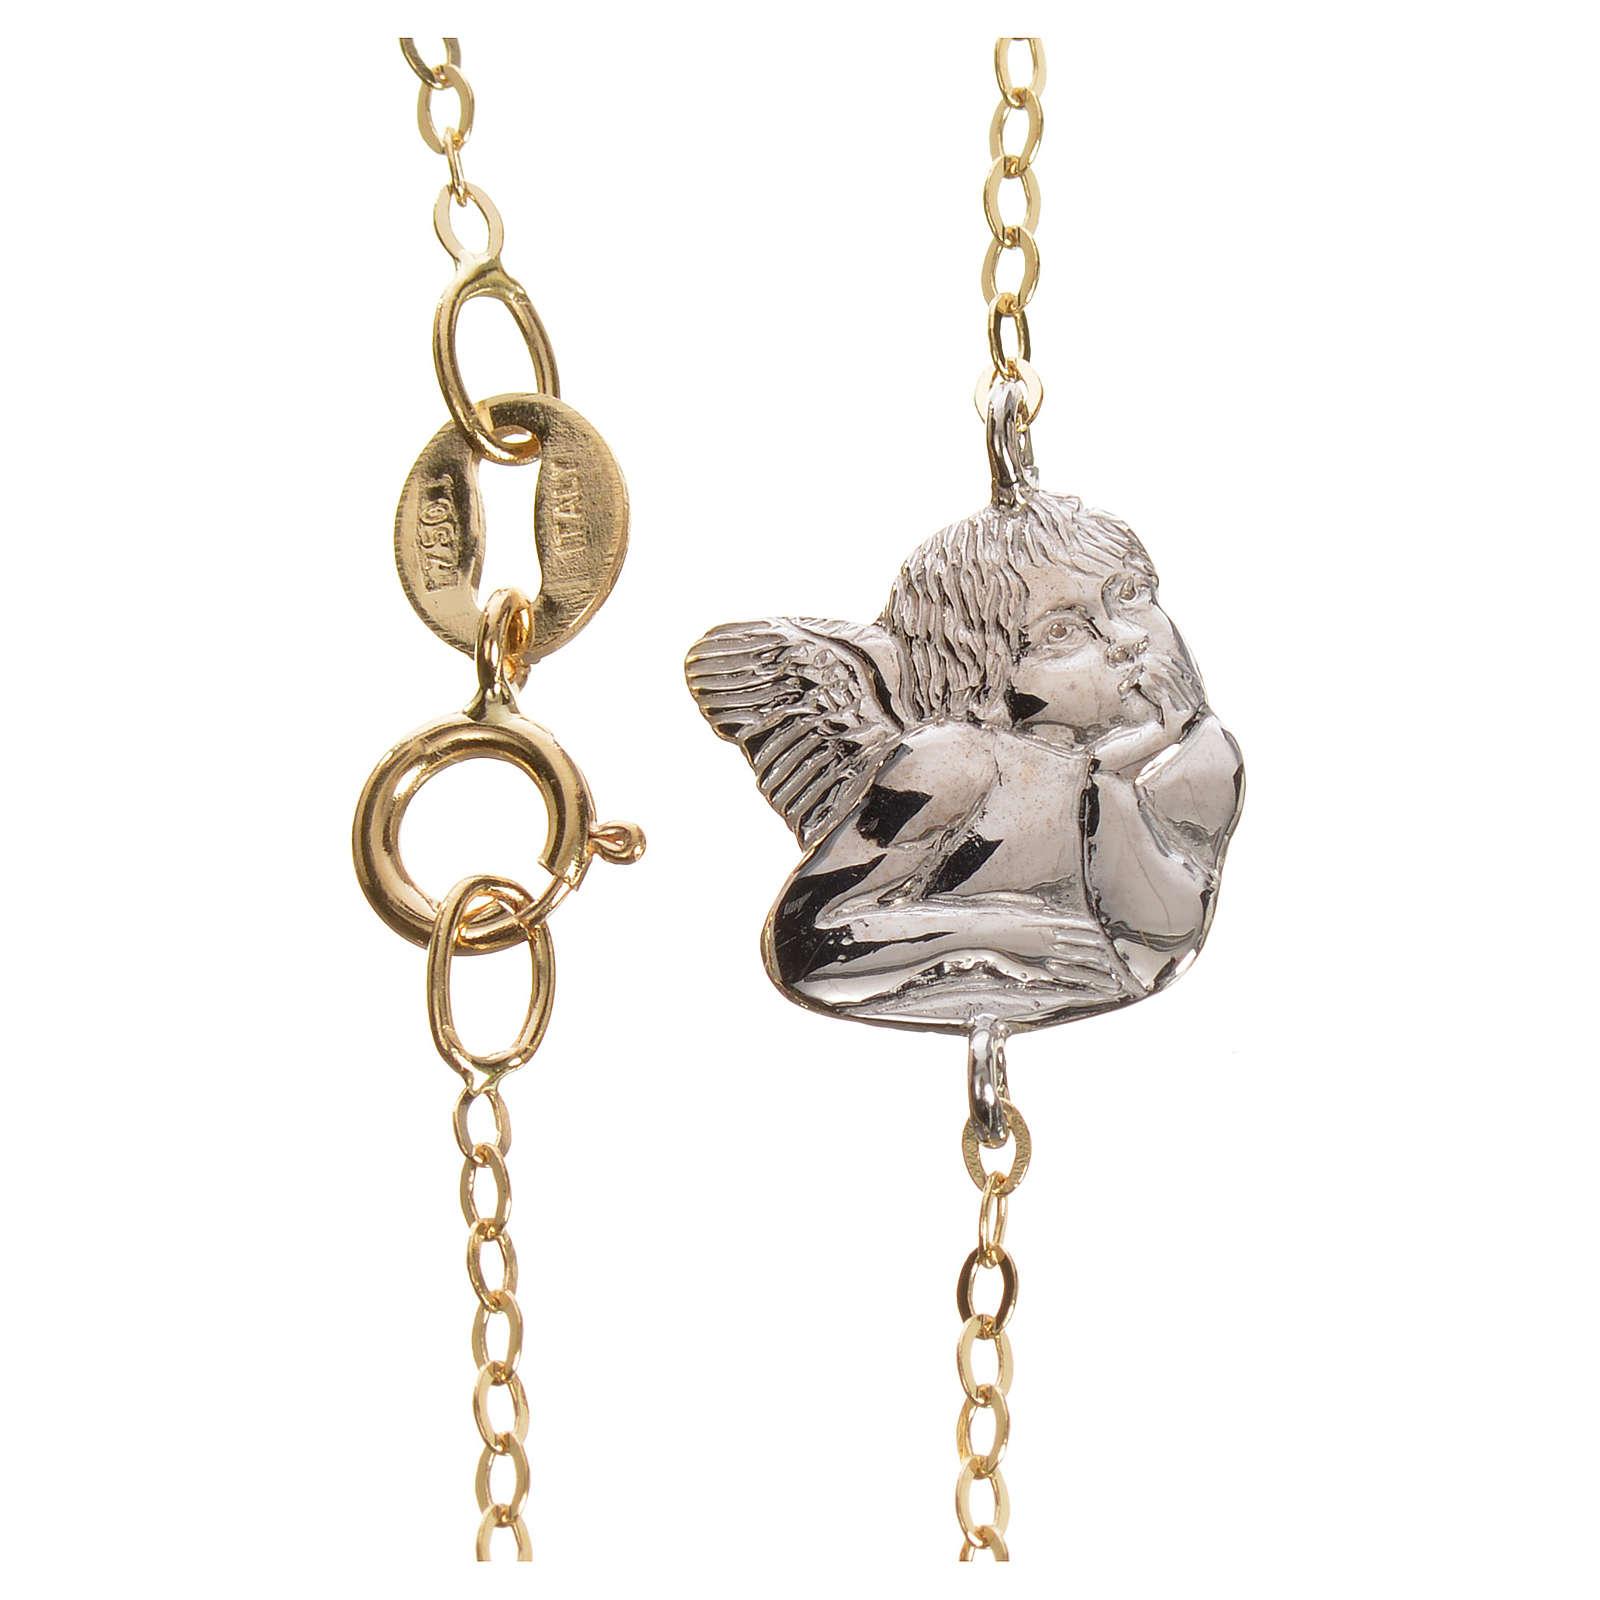 Bracciale angelo oro 750/00 bianco e giallo - gr. 1,27 4